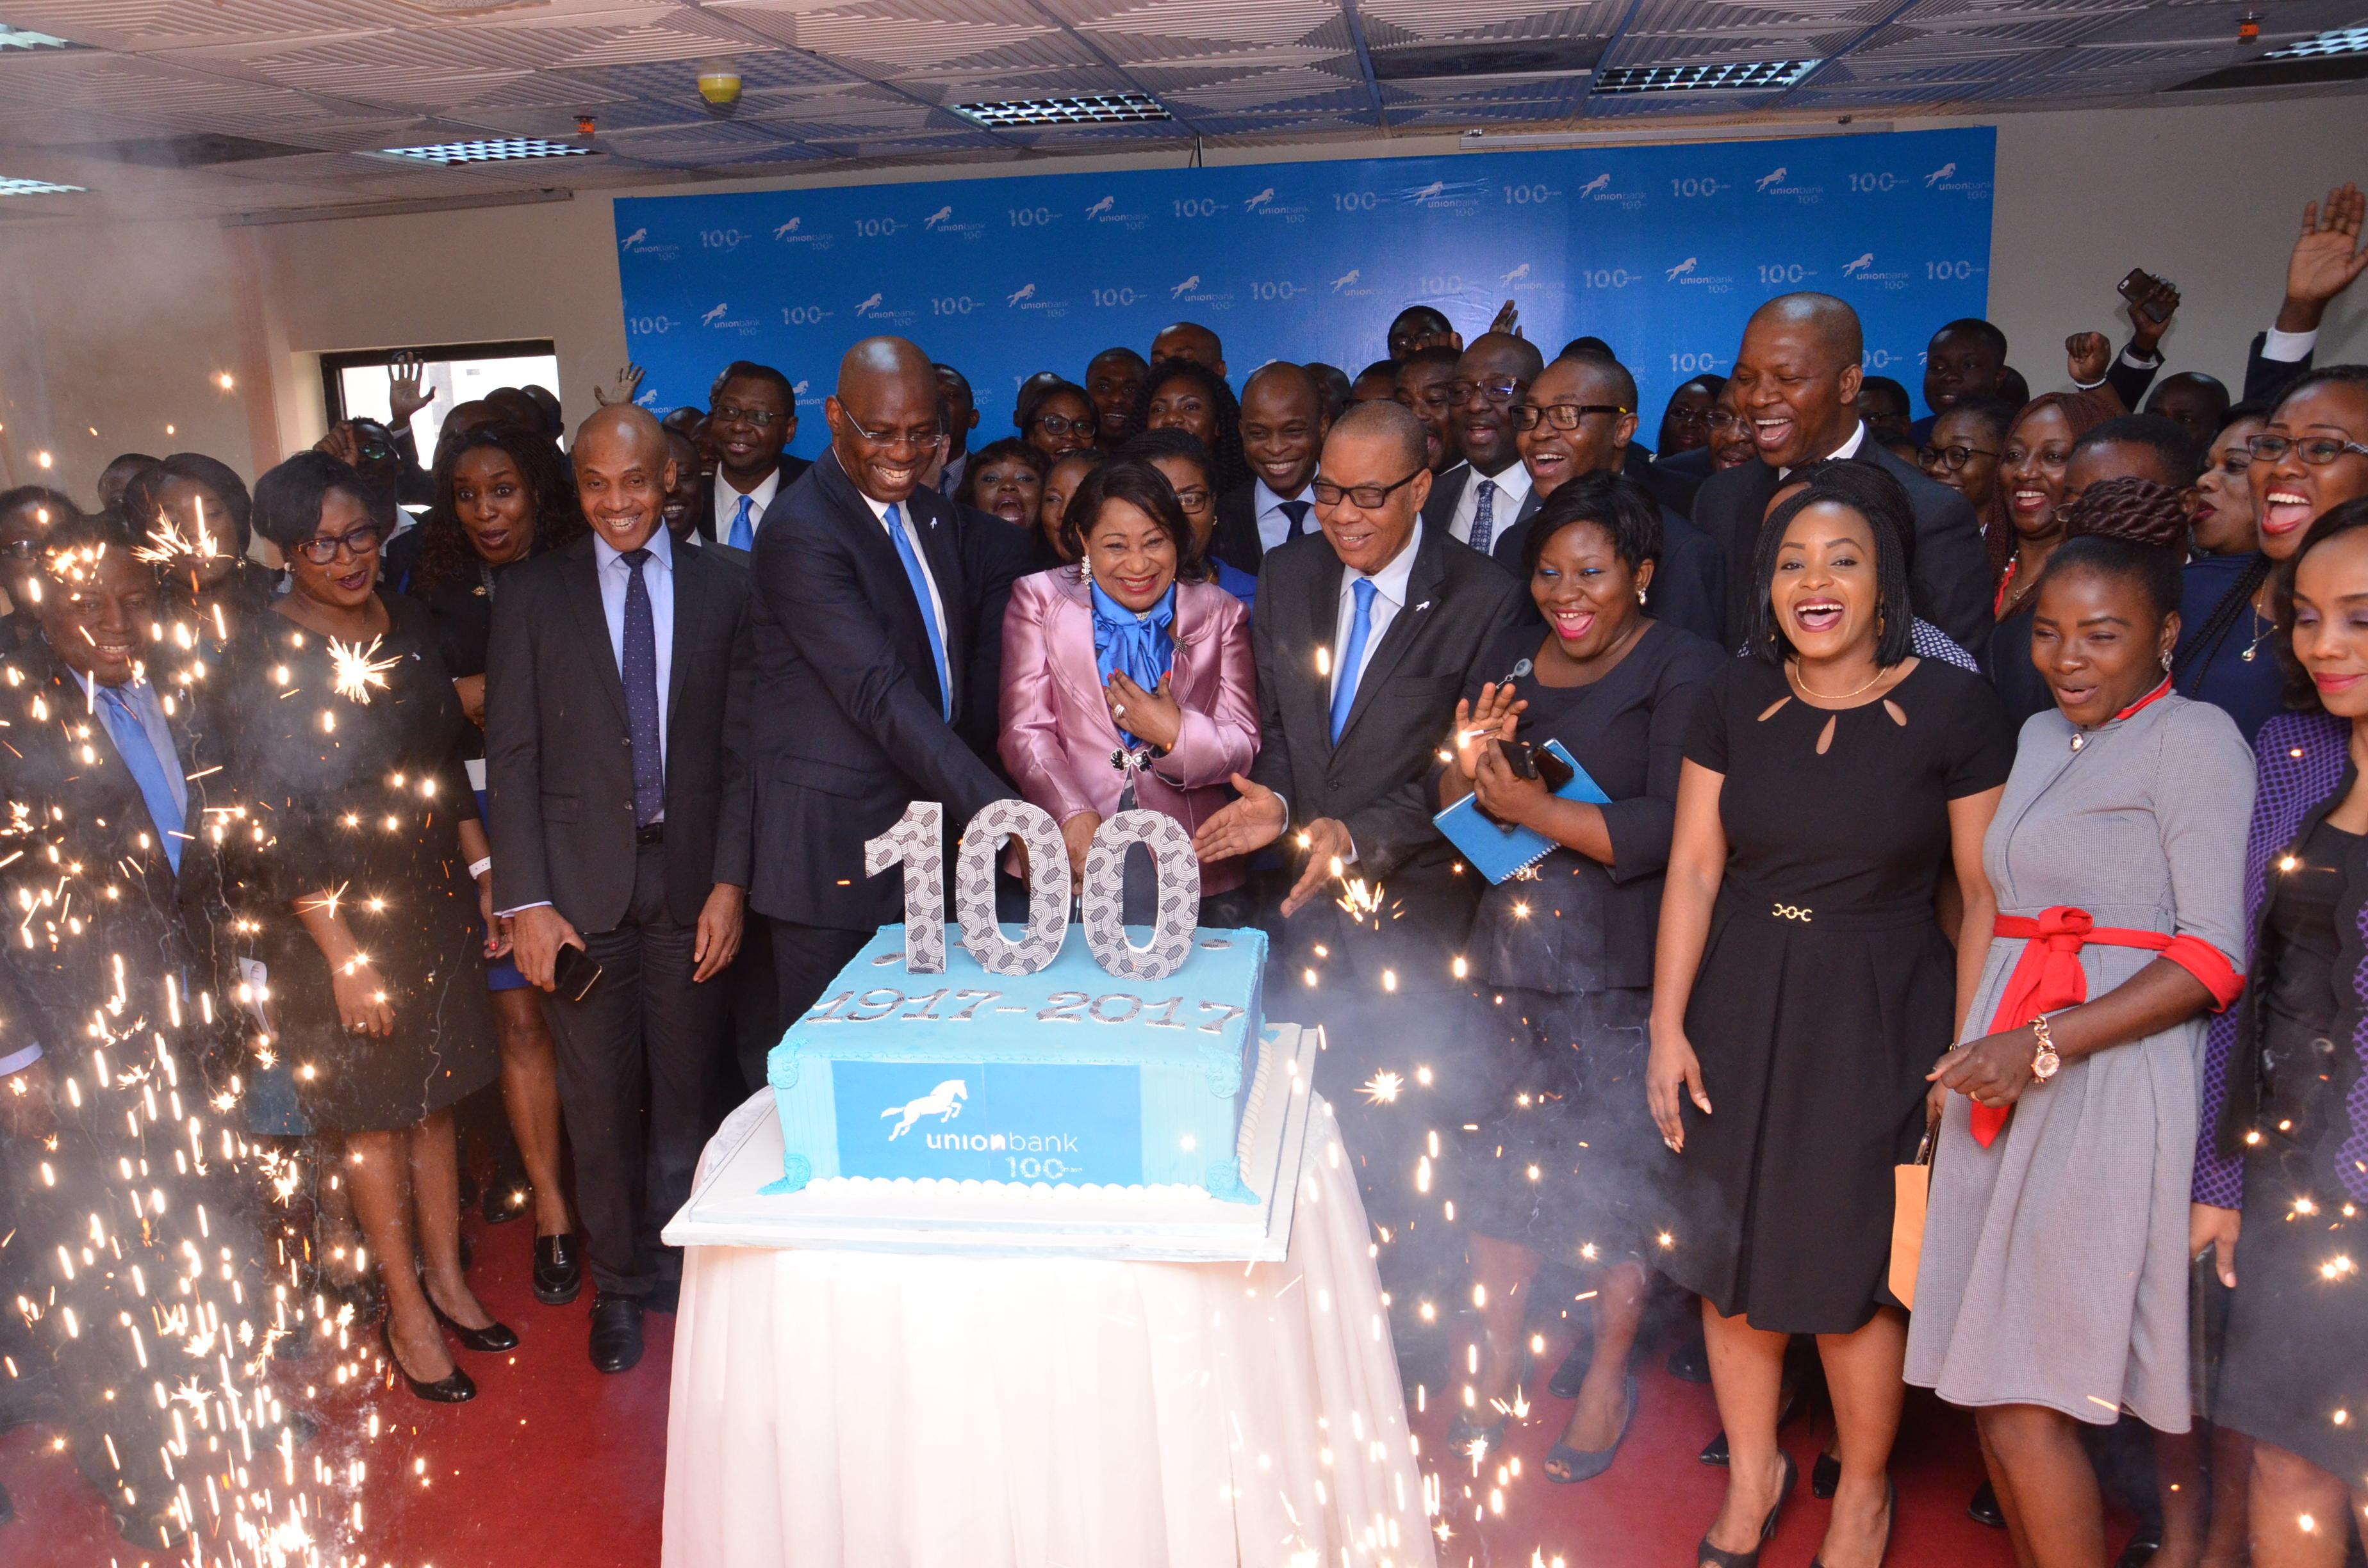 Celebrating Union Bank's 100-Year Anniversary